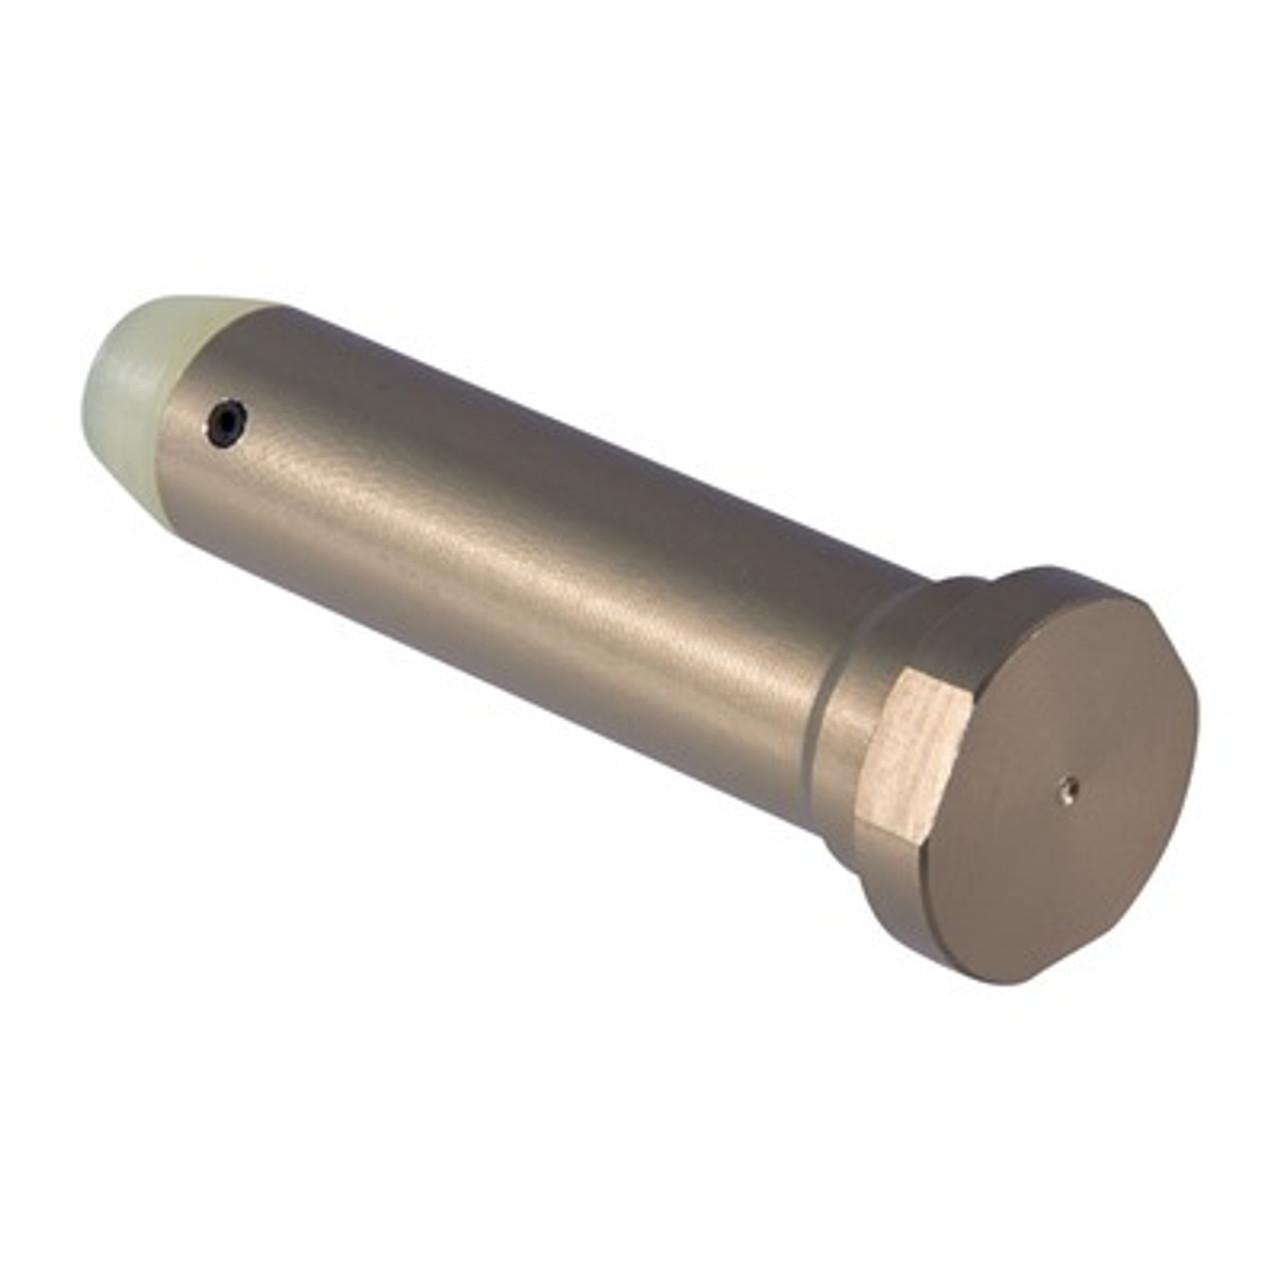 AR-15 H3 Carbine Buffer (5.4 oz)